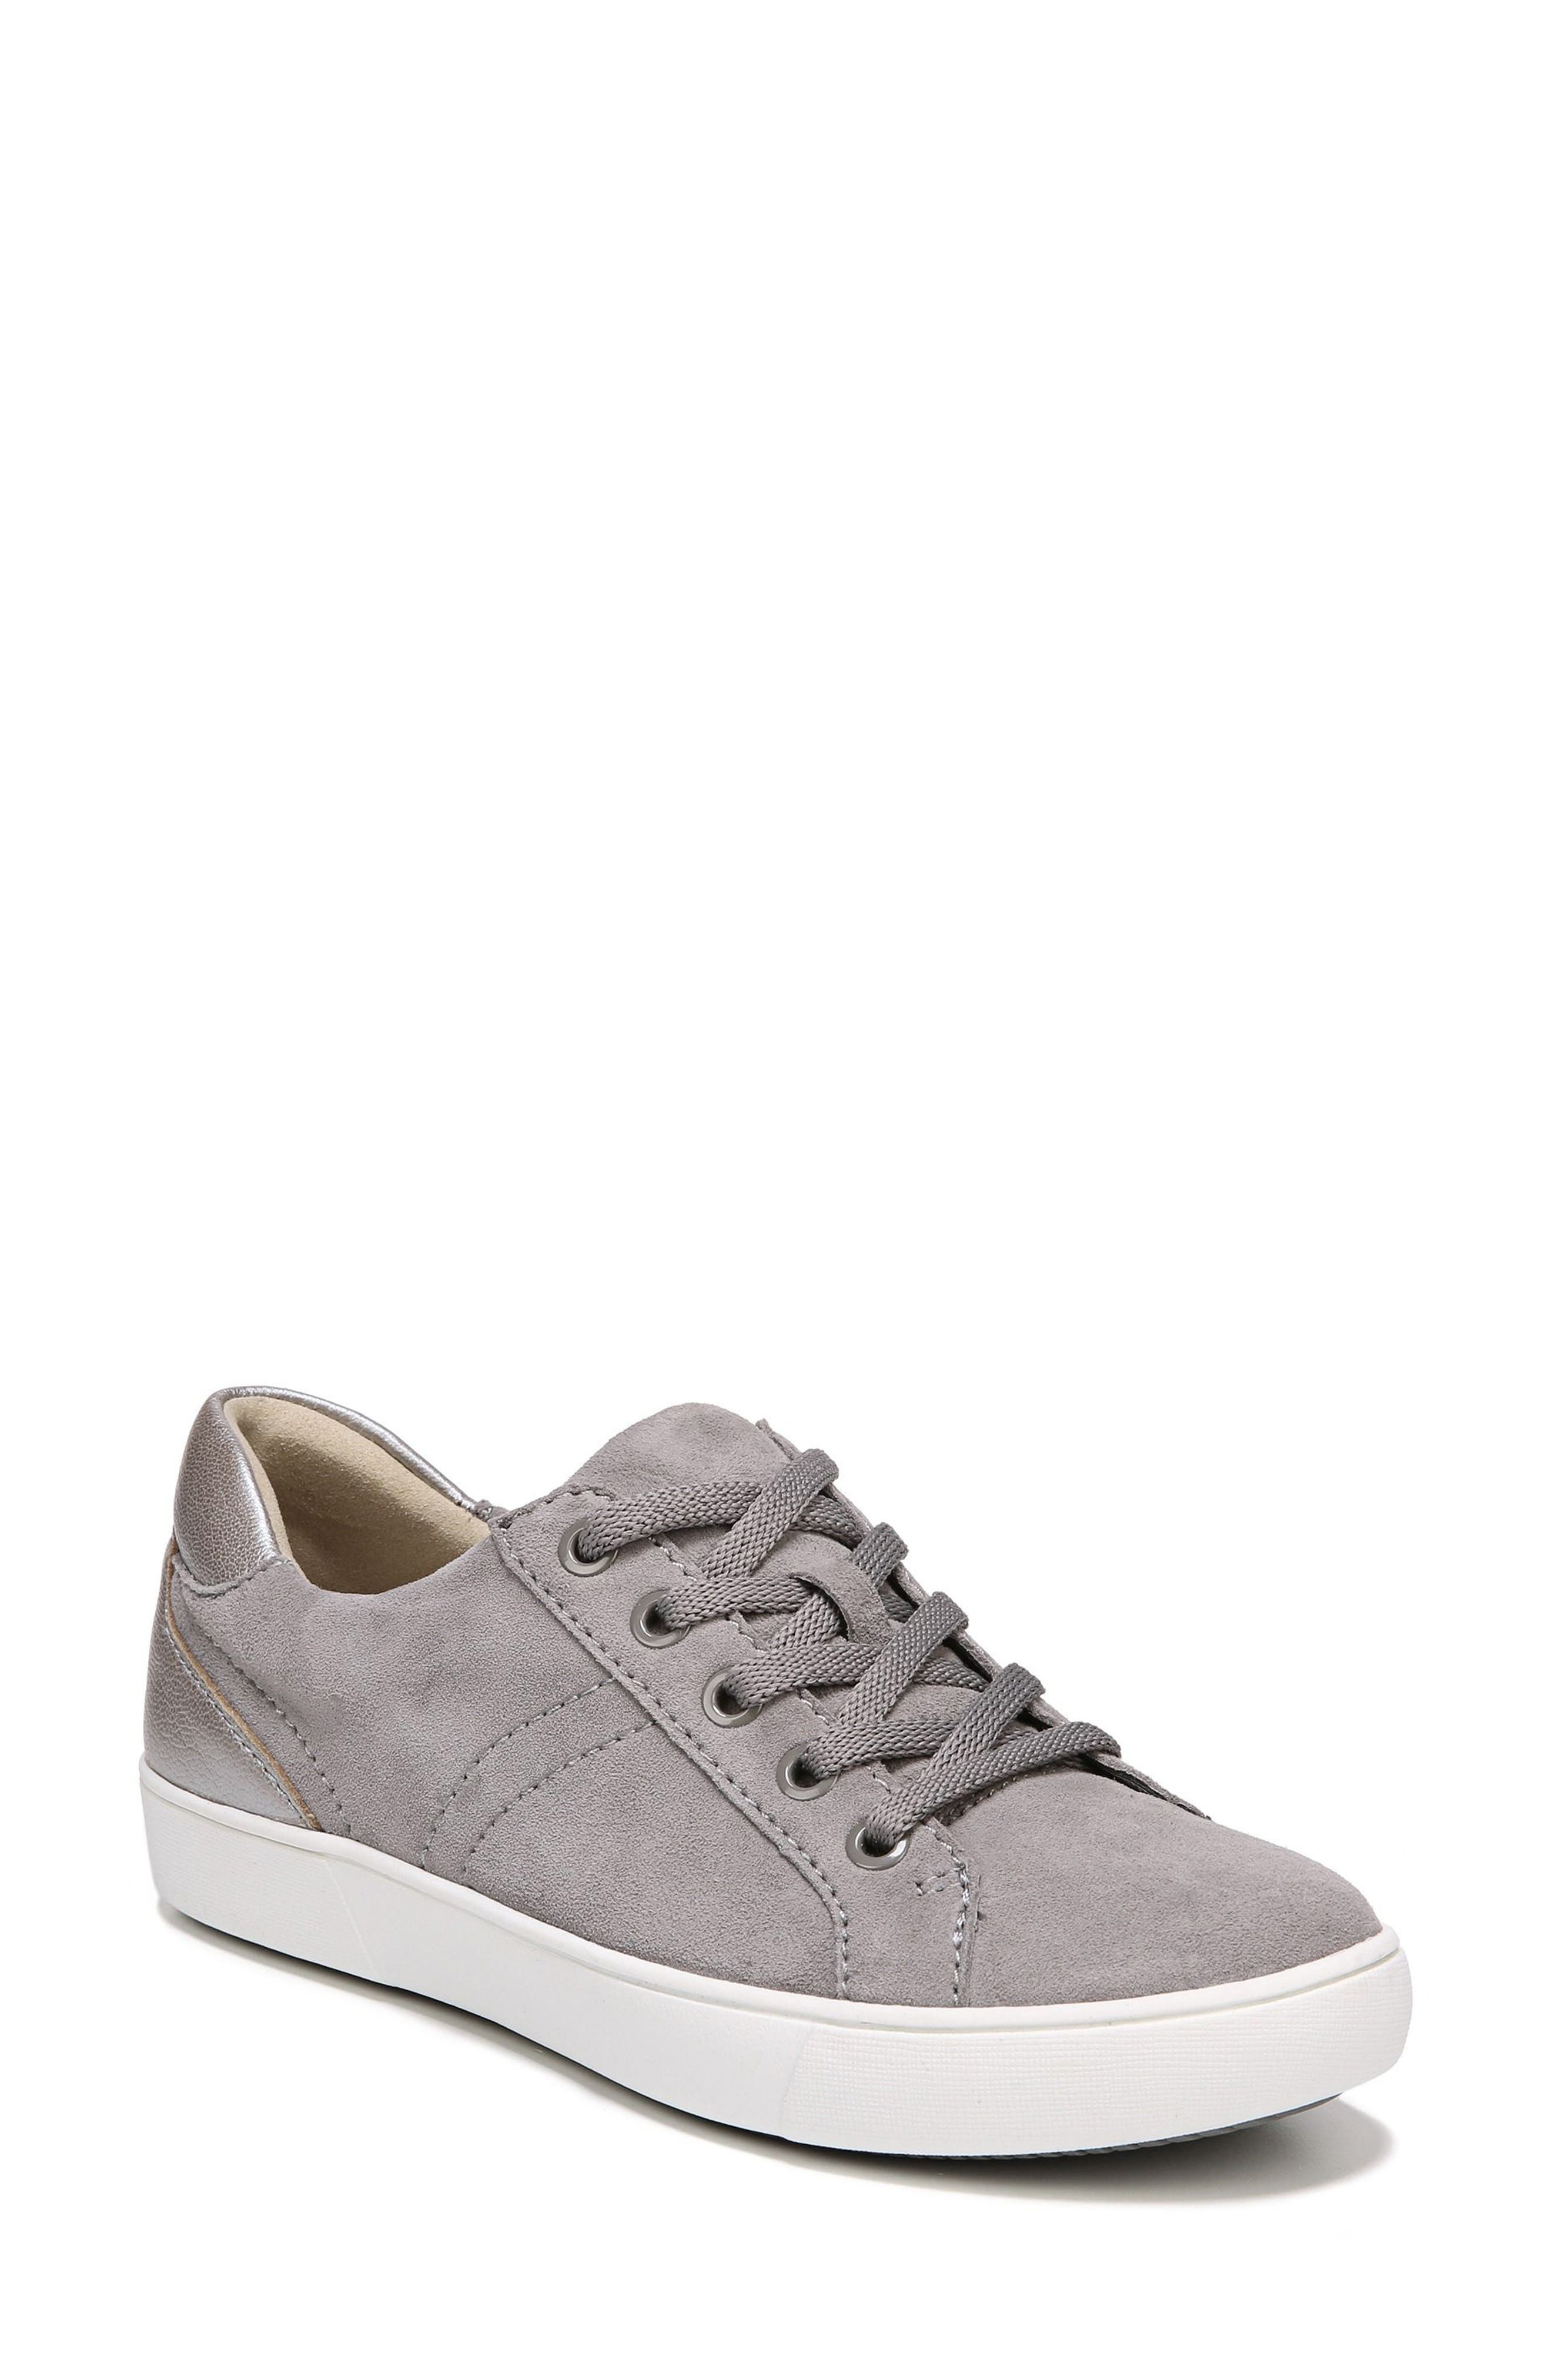 NATURALIZER, Morrison Sneaker, Main thumbnail 1, color, GREY SUEDE